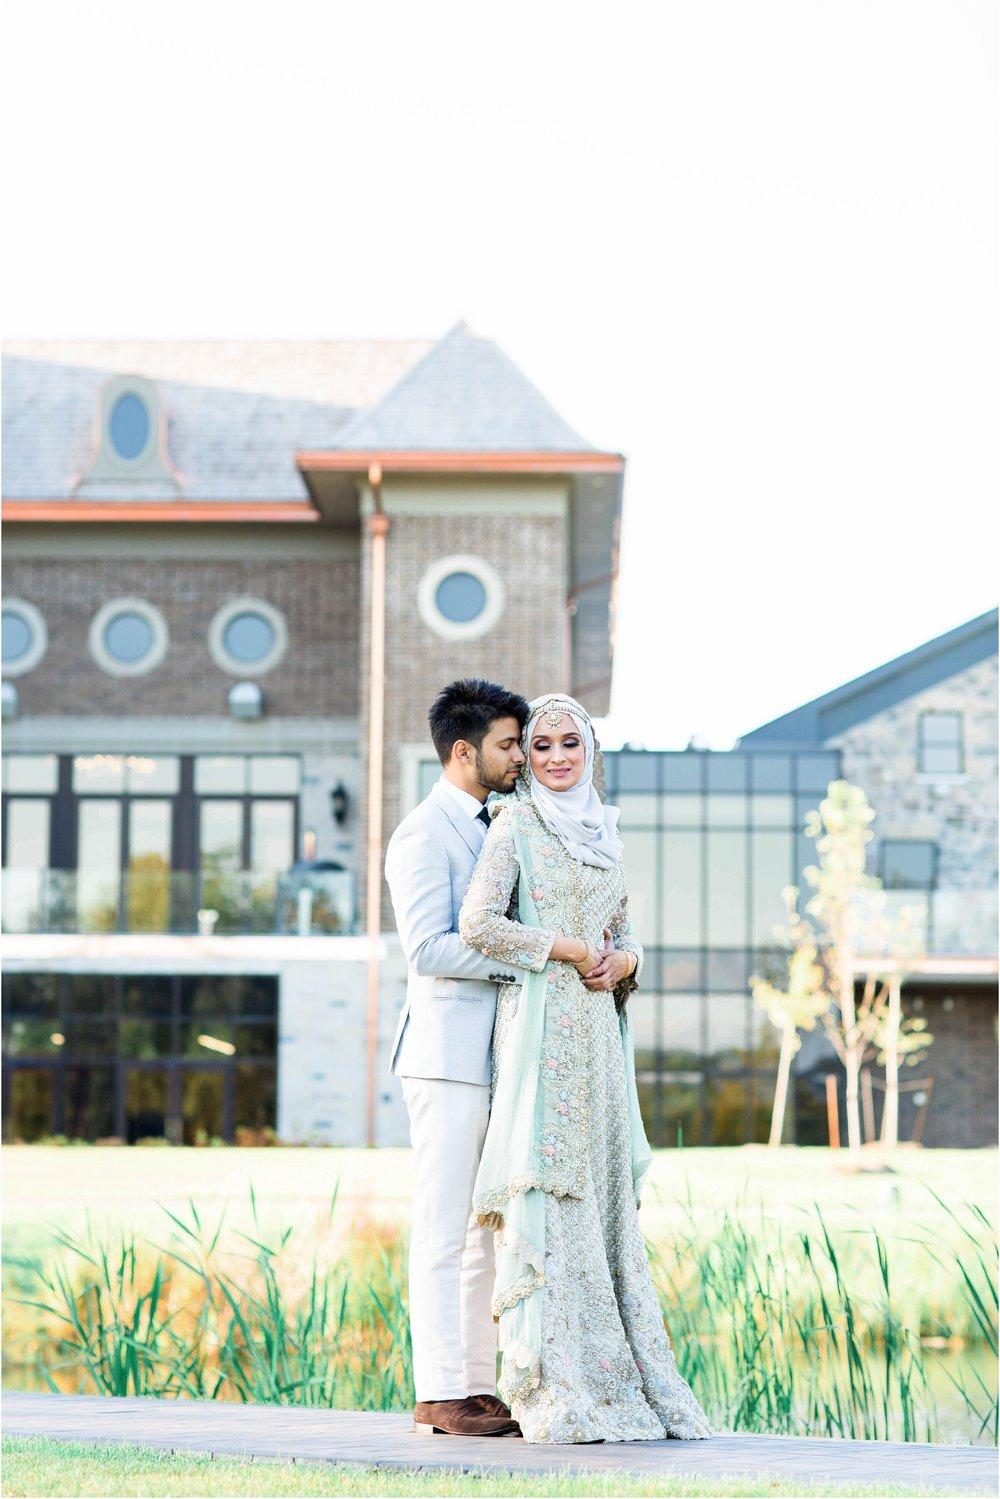 Best-of-2017-Weddings-Toronto-Mississauga-Brampton-Scarborough-GTA-Pakistani-Indian-Wedding-Engagement-Photographer-Photography_0005.jpg